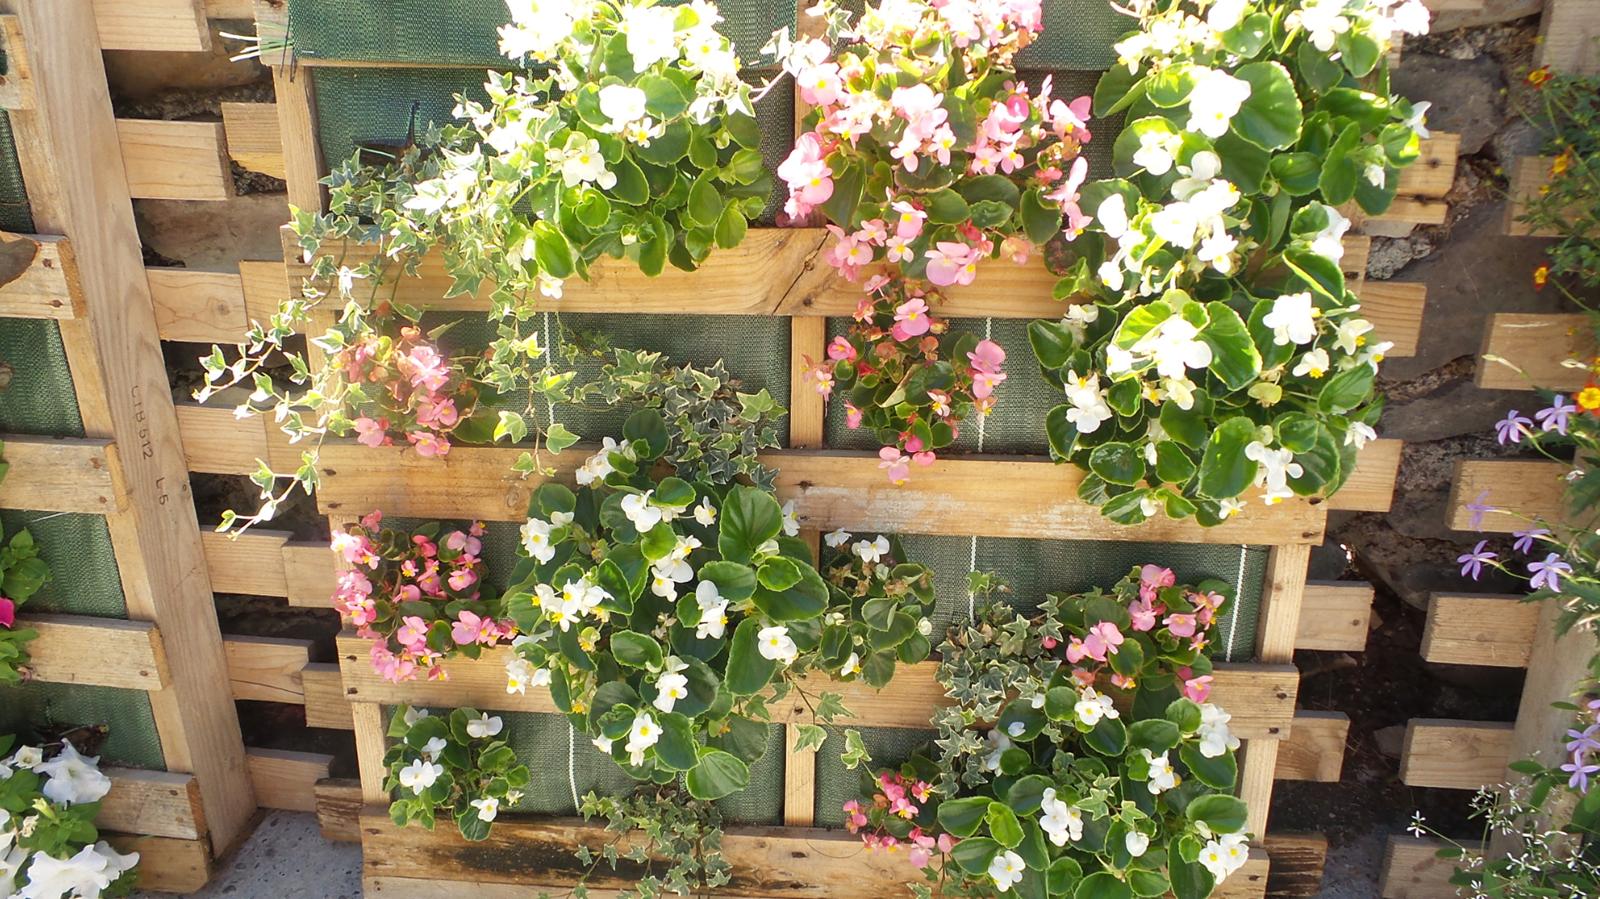 R aliser des palettes fleuries for Organiser son jardin potager